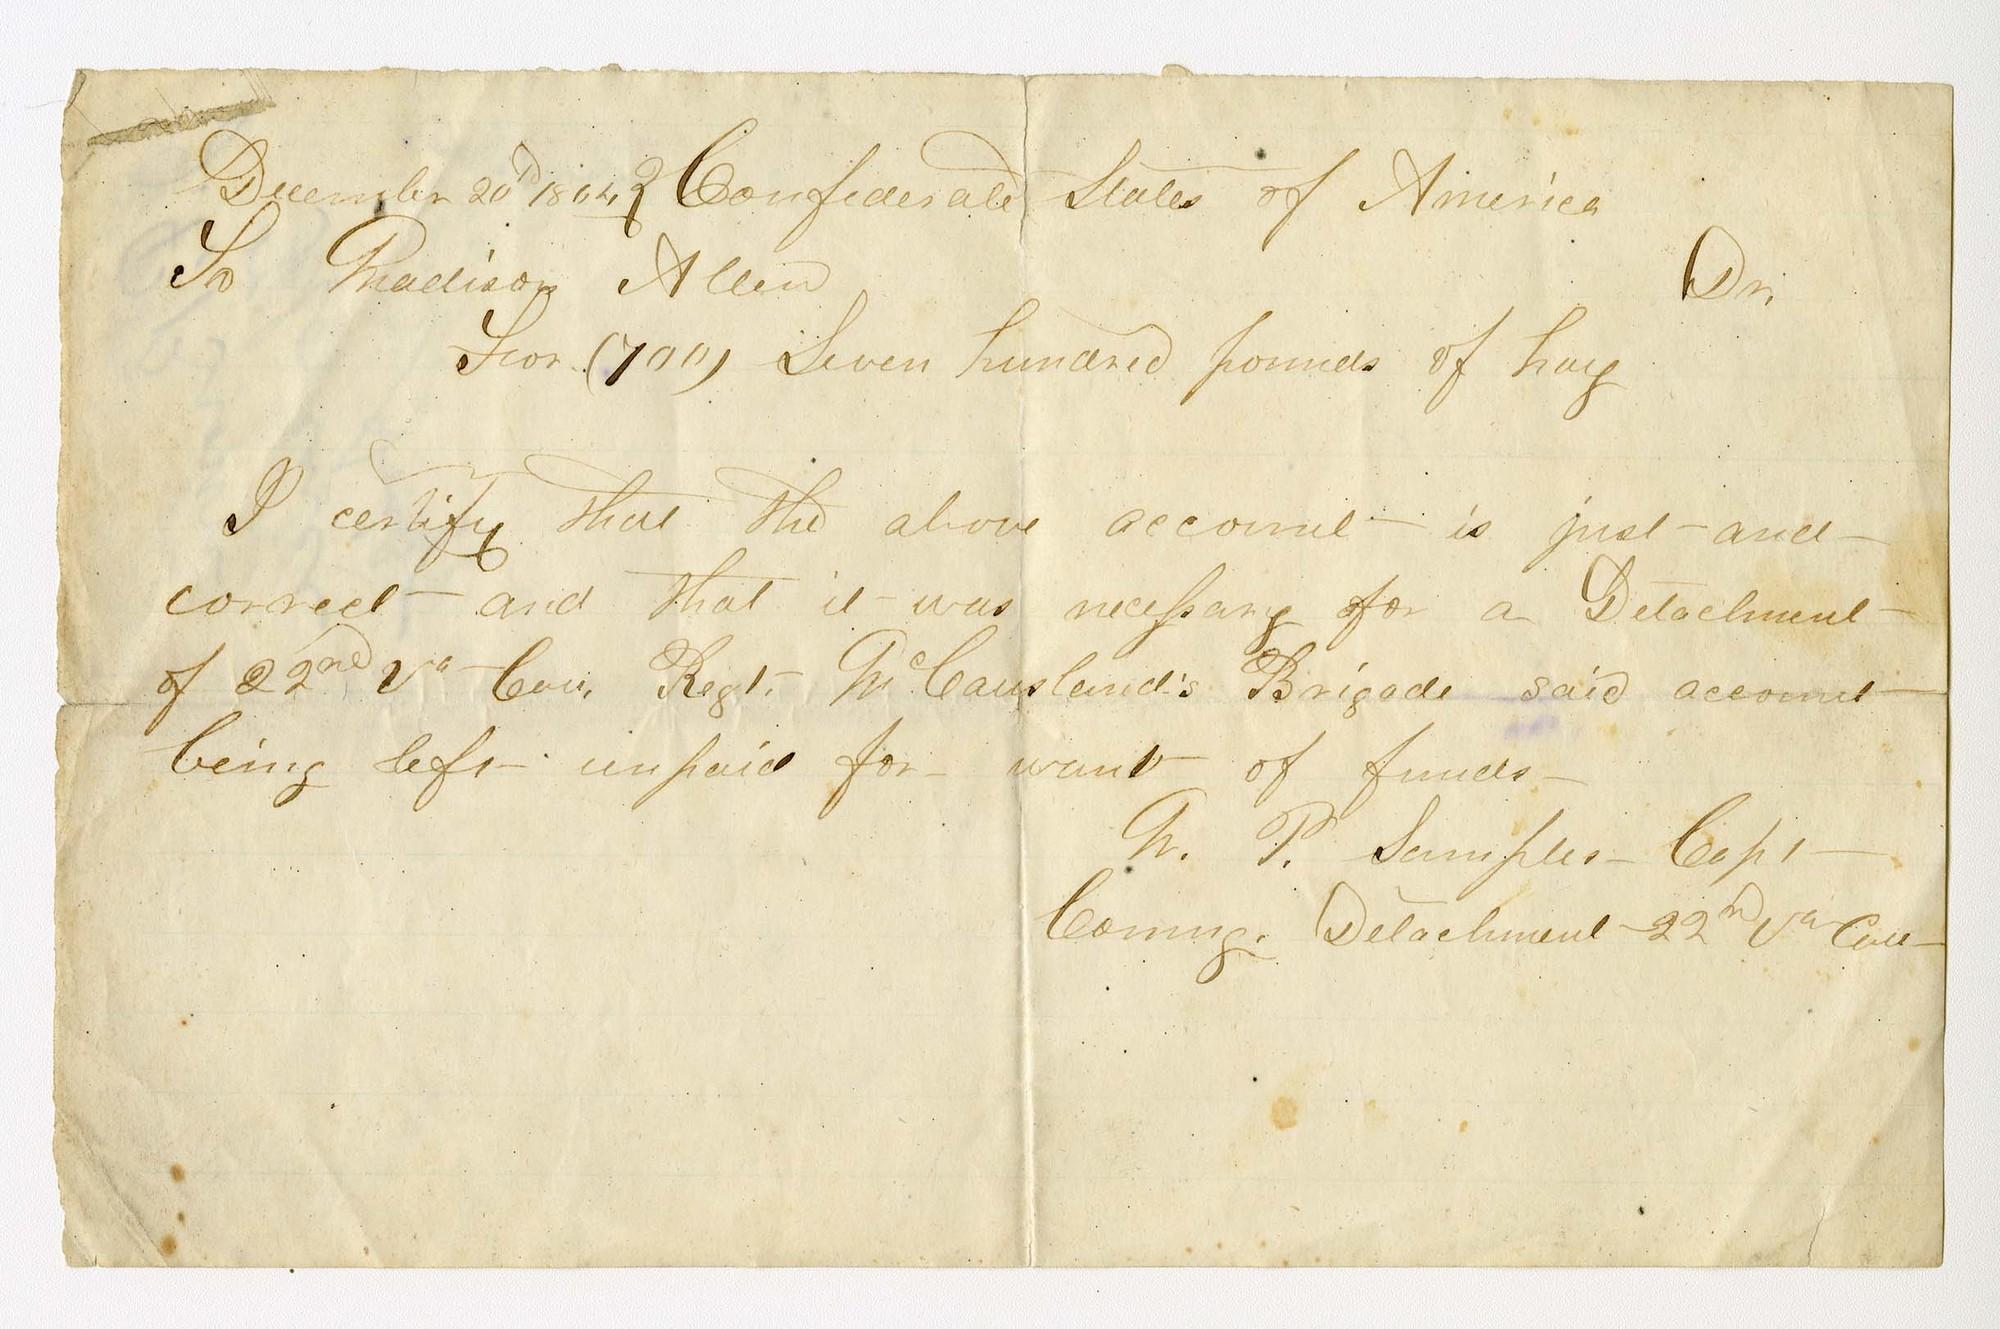 Ms1996_008_CarpenterHenryC_Letter_1864_1220a.jpg